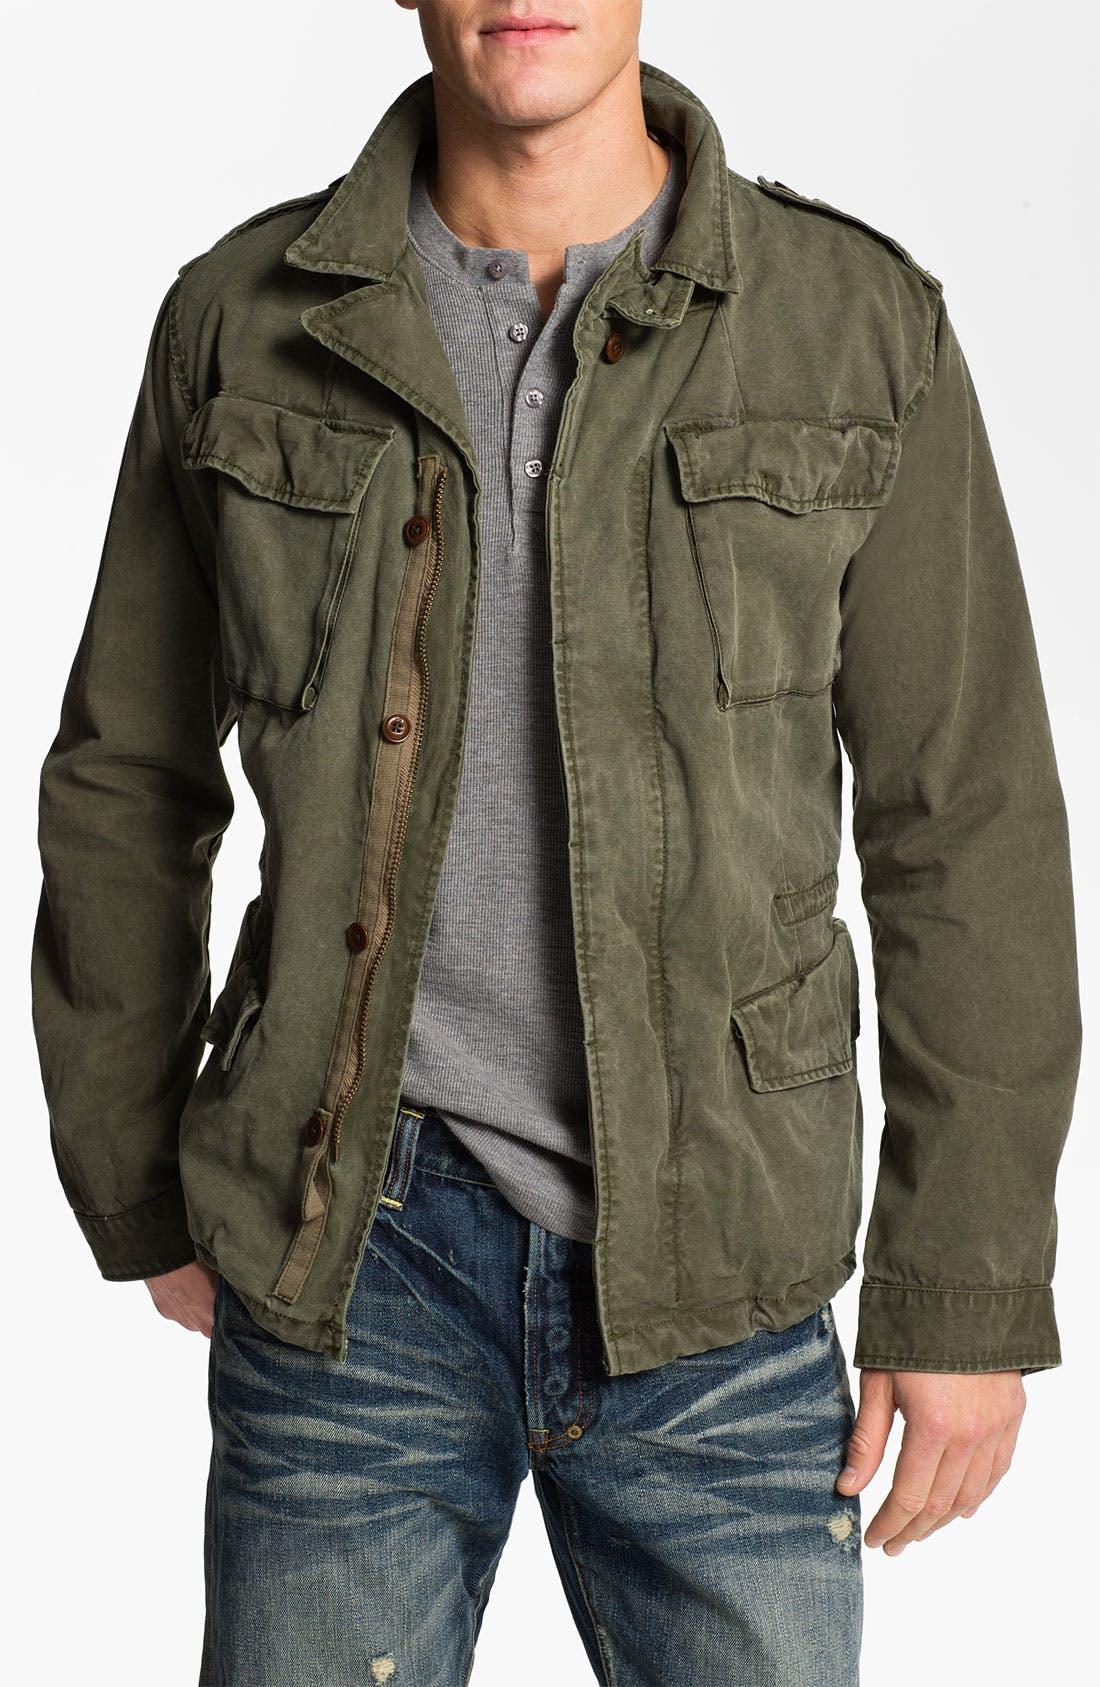 Alternate Image 1 Selected - Scotch & Soda Military Jacket